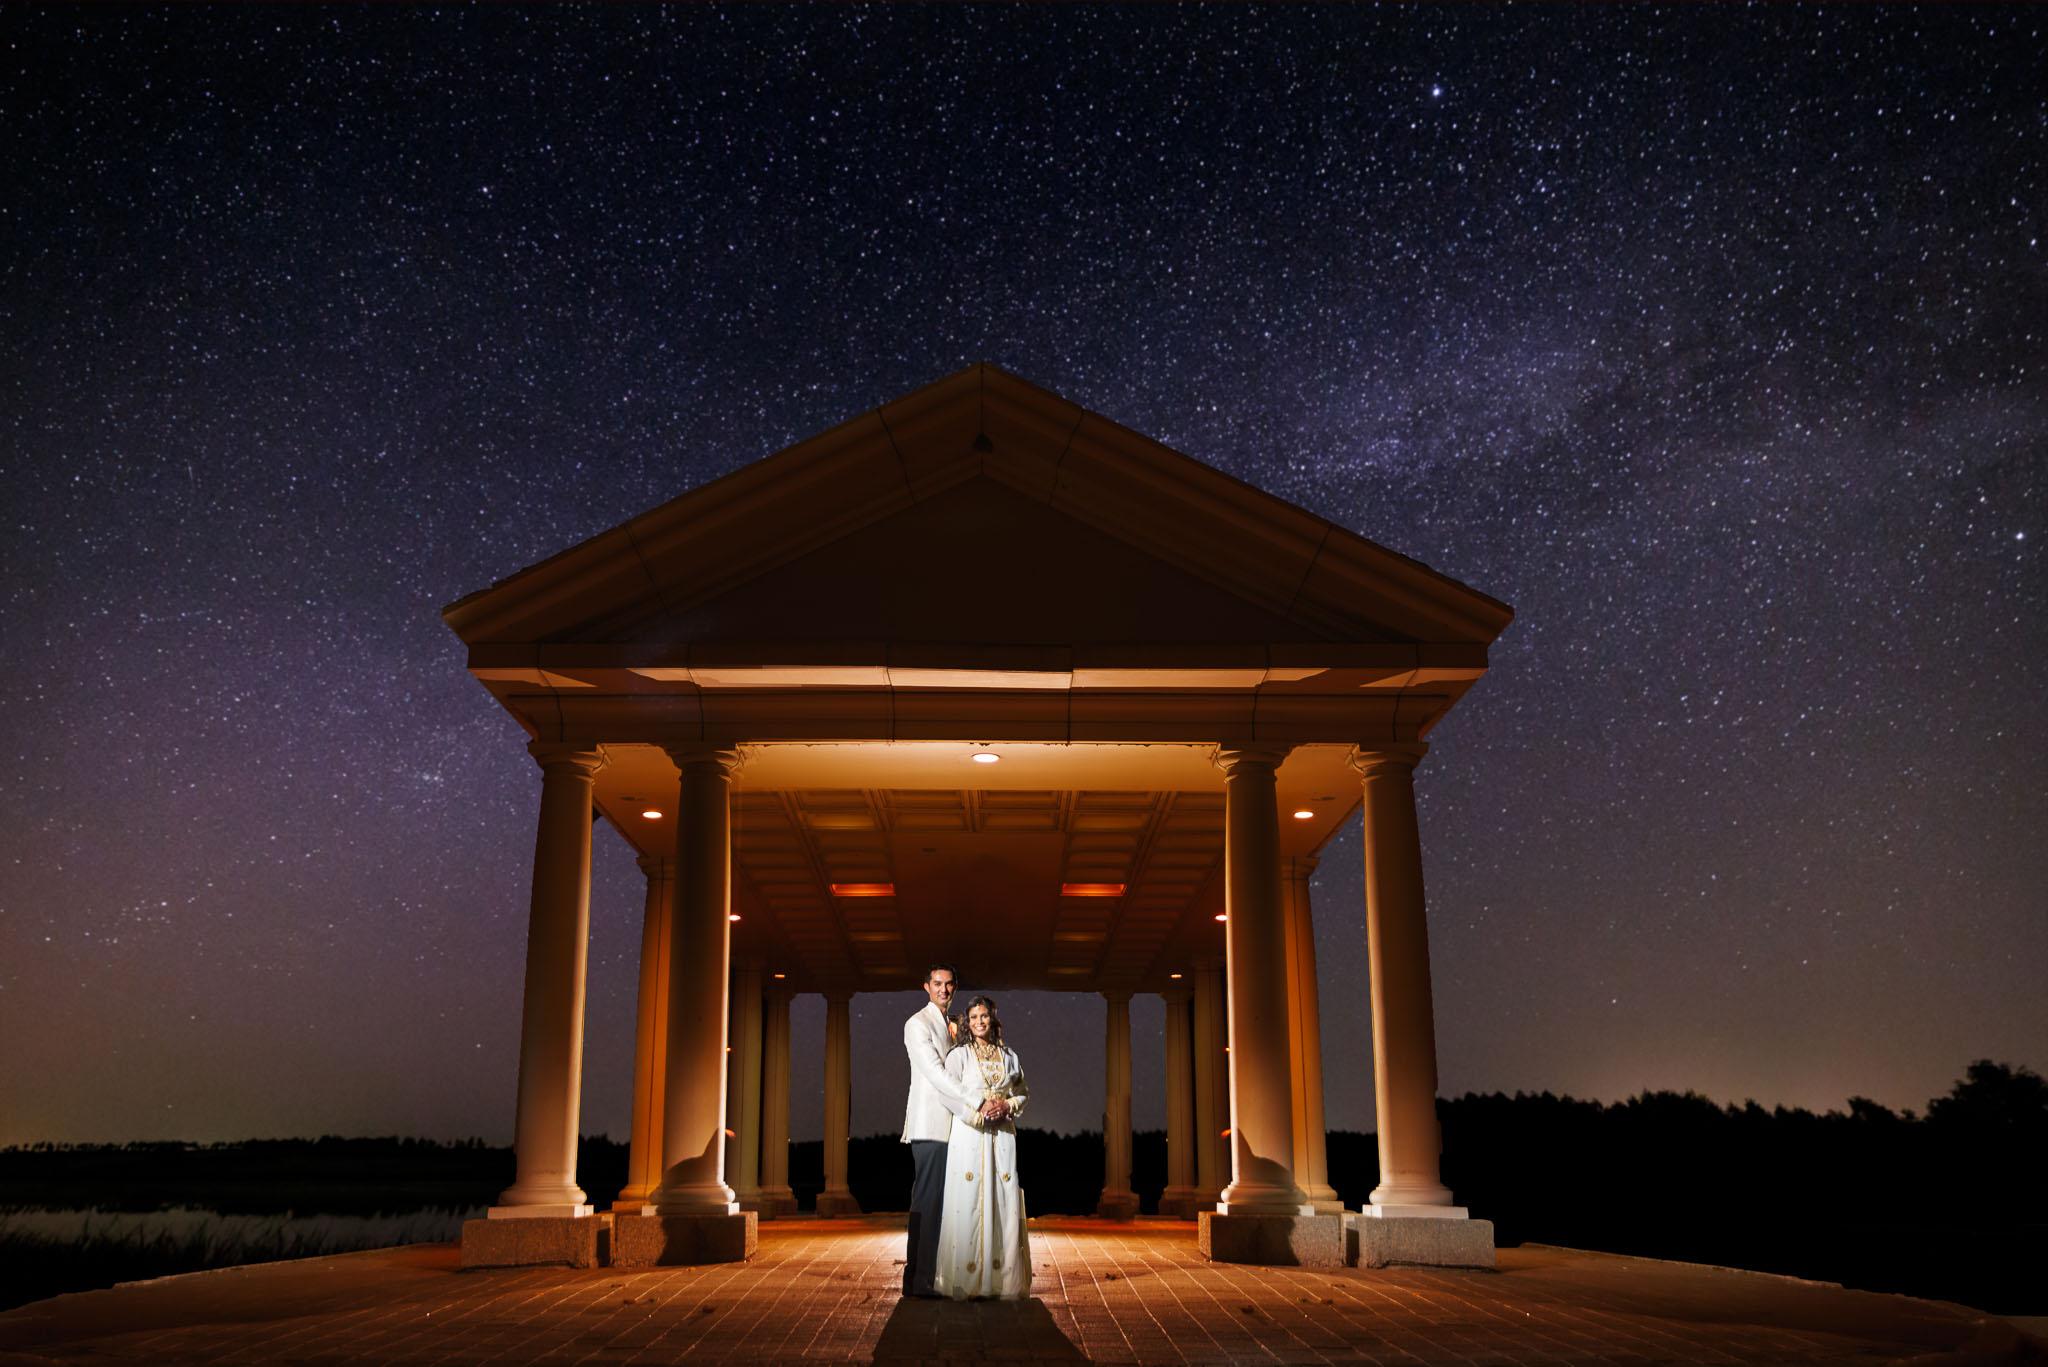 Hamilton wedding photographer hindhu wedding indian wedding mississauga convention centre mississauga wedding photographer night photography